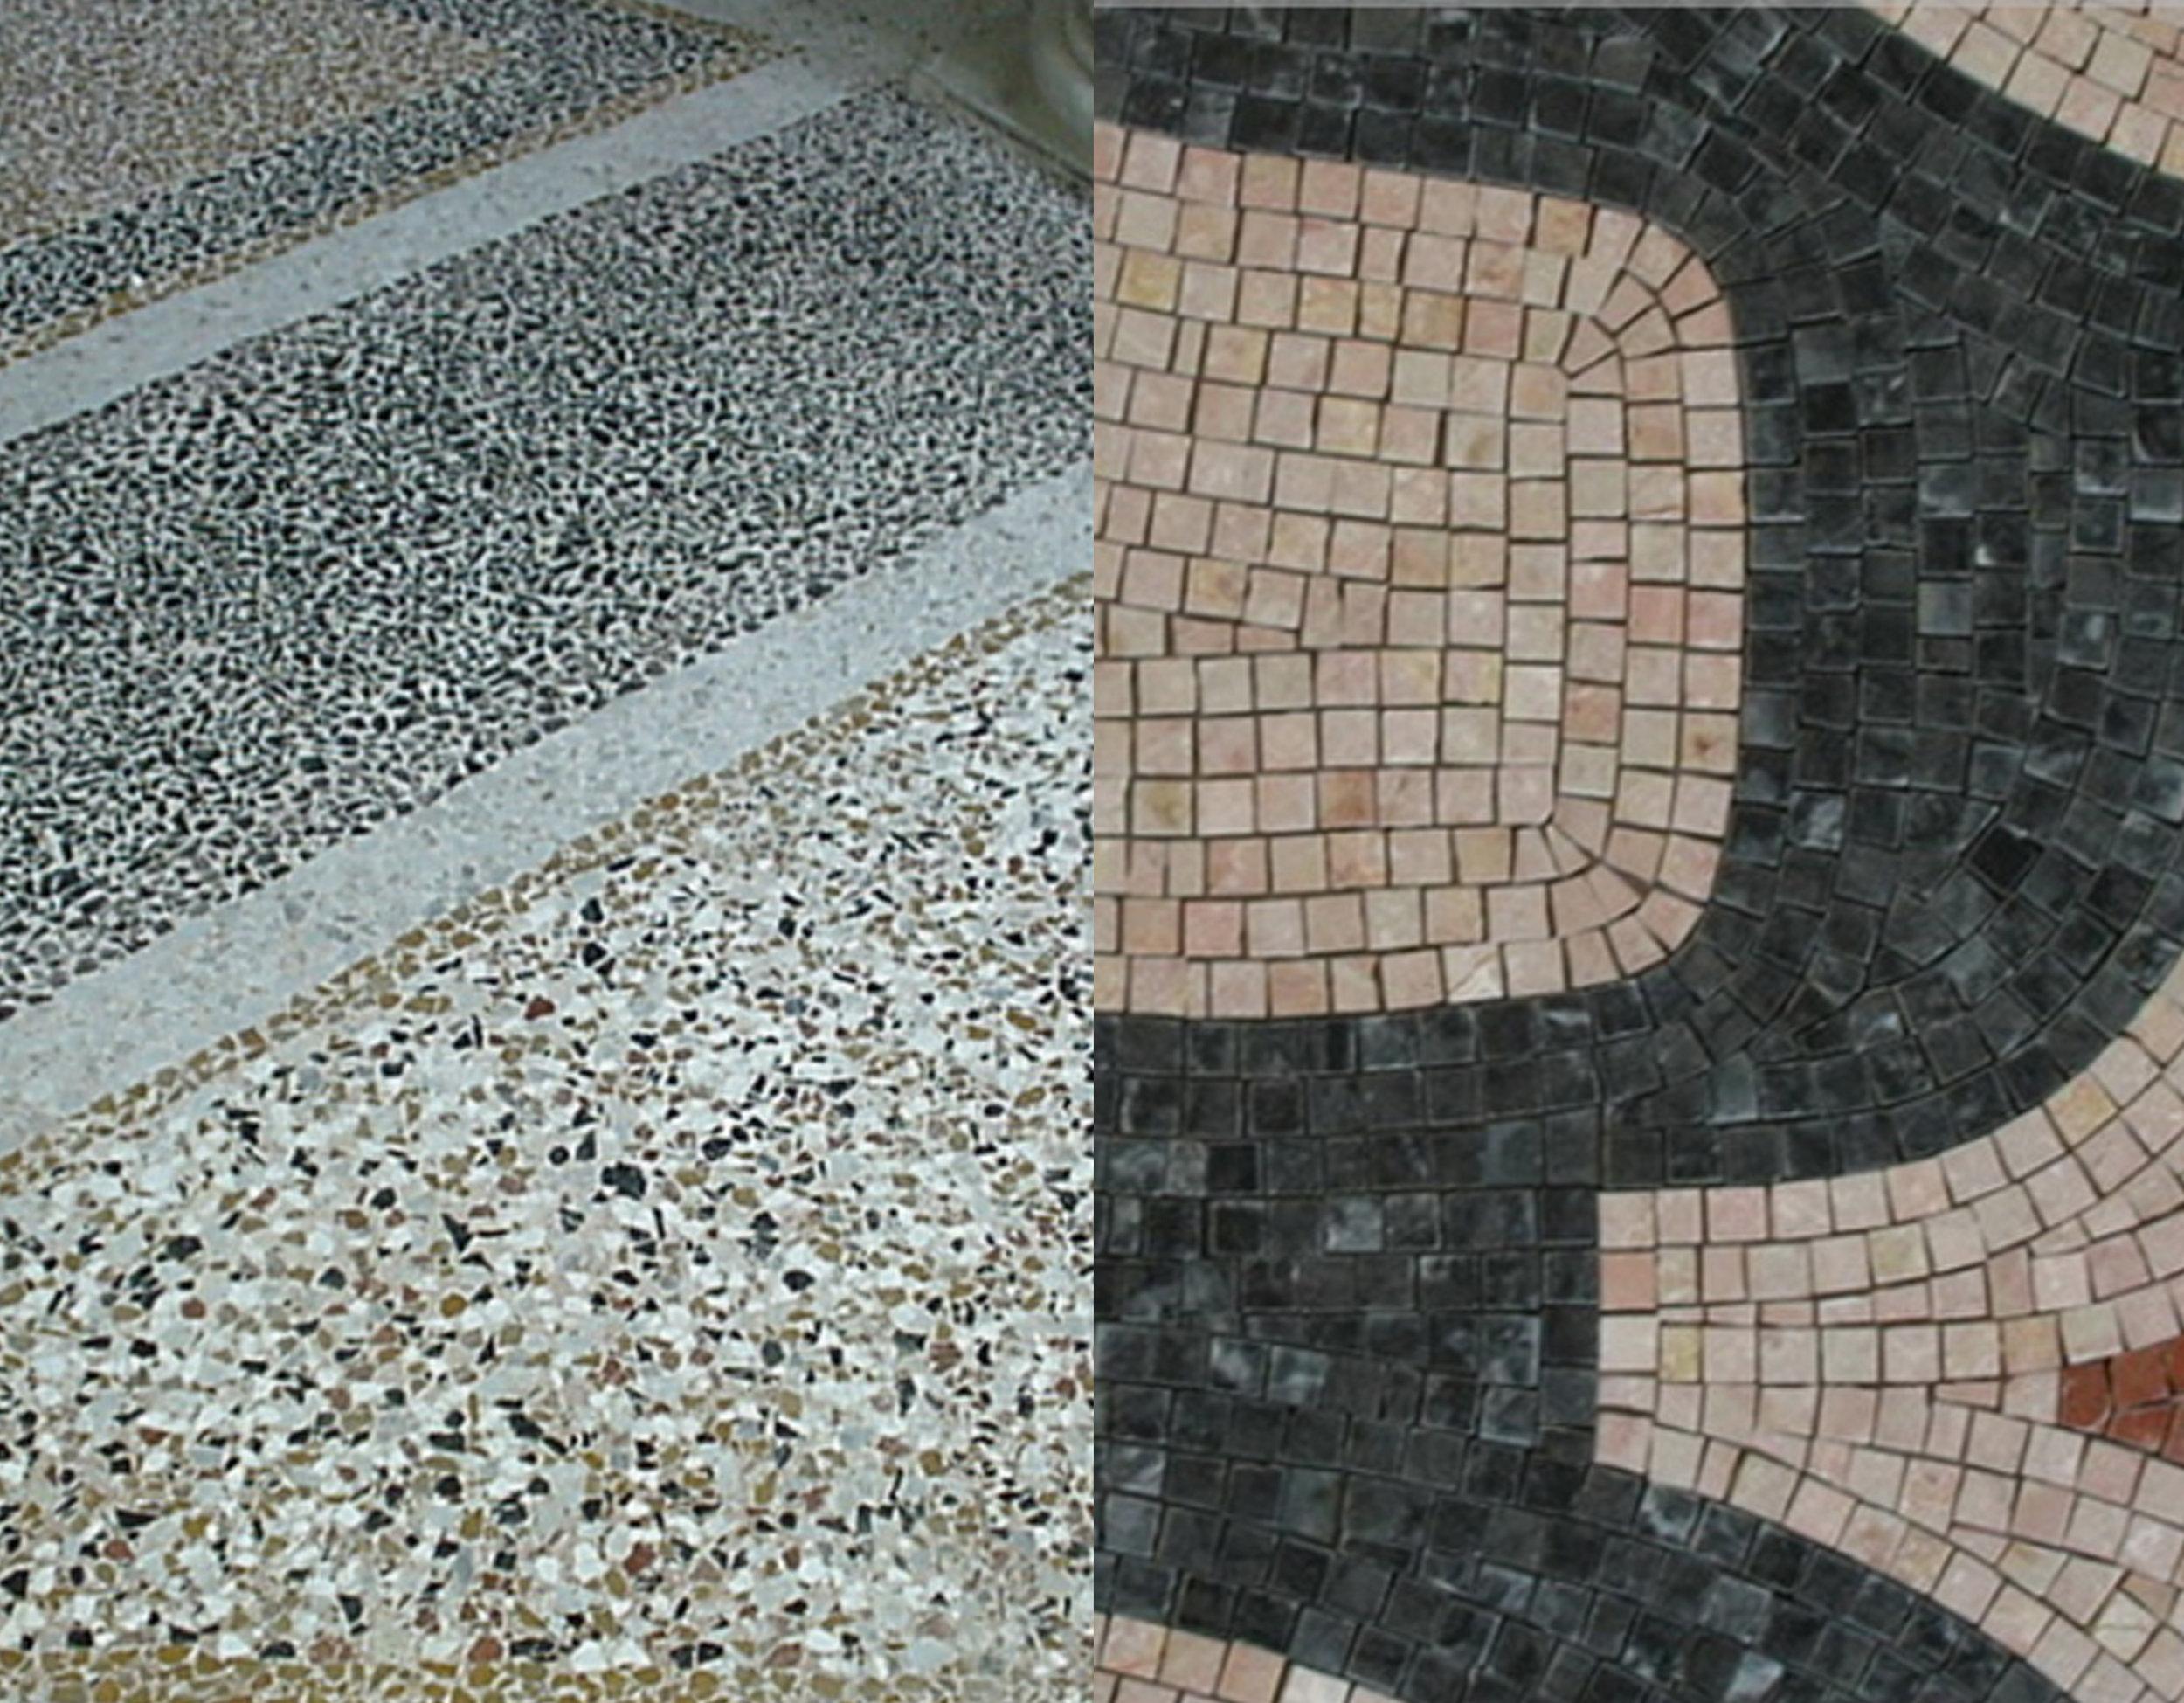 terrazzo versus mosaic via  Morseletto